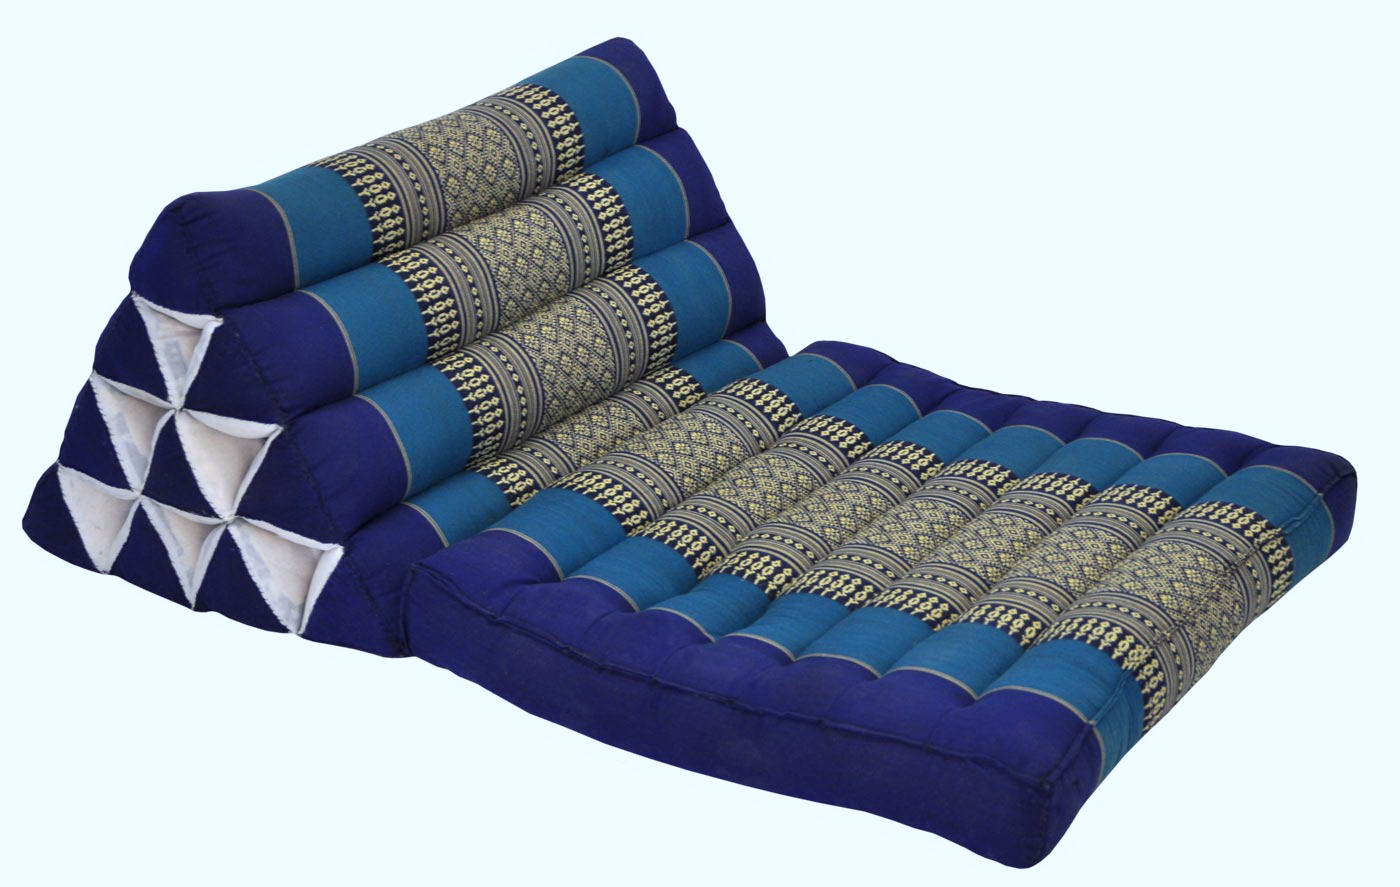 Coussins thai matelas yoga canape oreiller polochon for Tapis de yoga avec canape sun